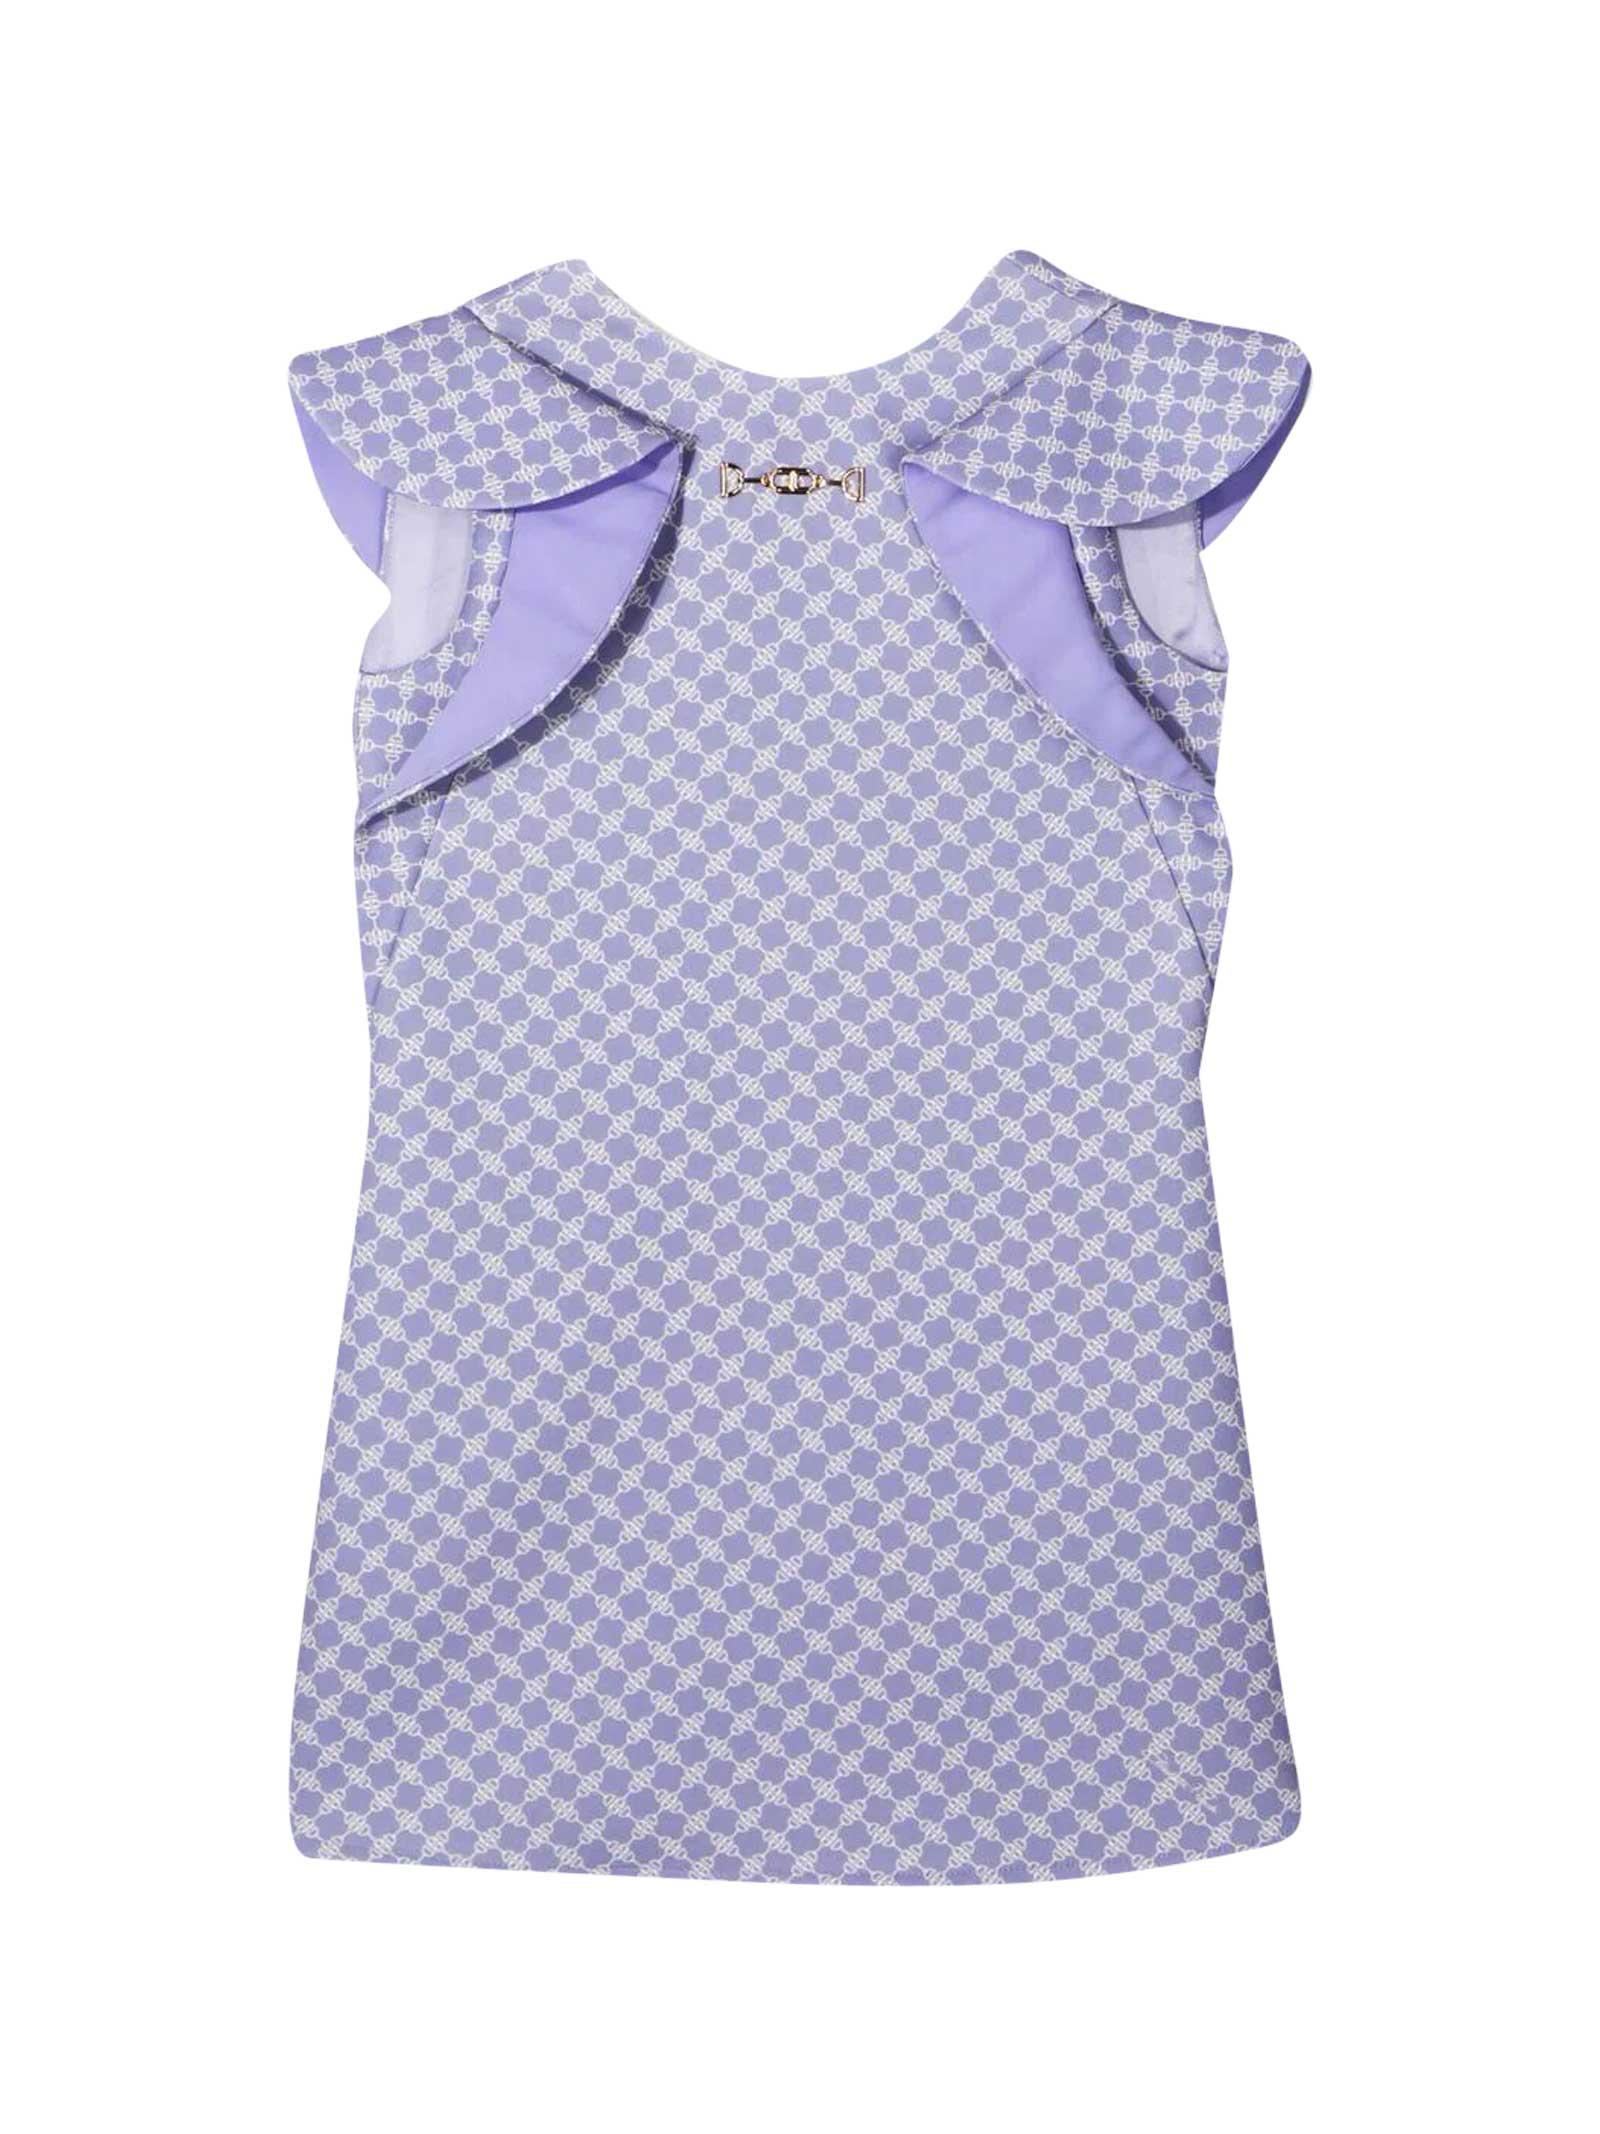 Elisabetta Franchi La Mia Bambina Dresses DRESS WITH ELISABETTA FRANCHI MY GIRL PRINT